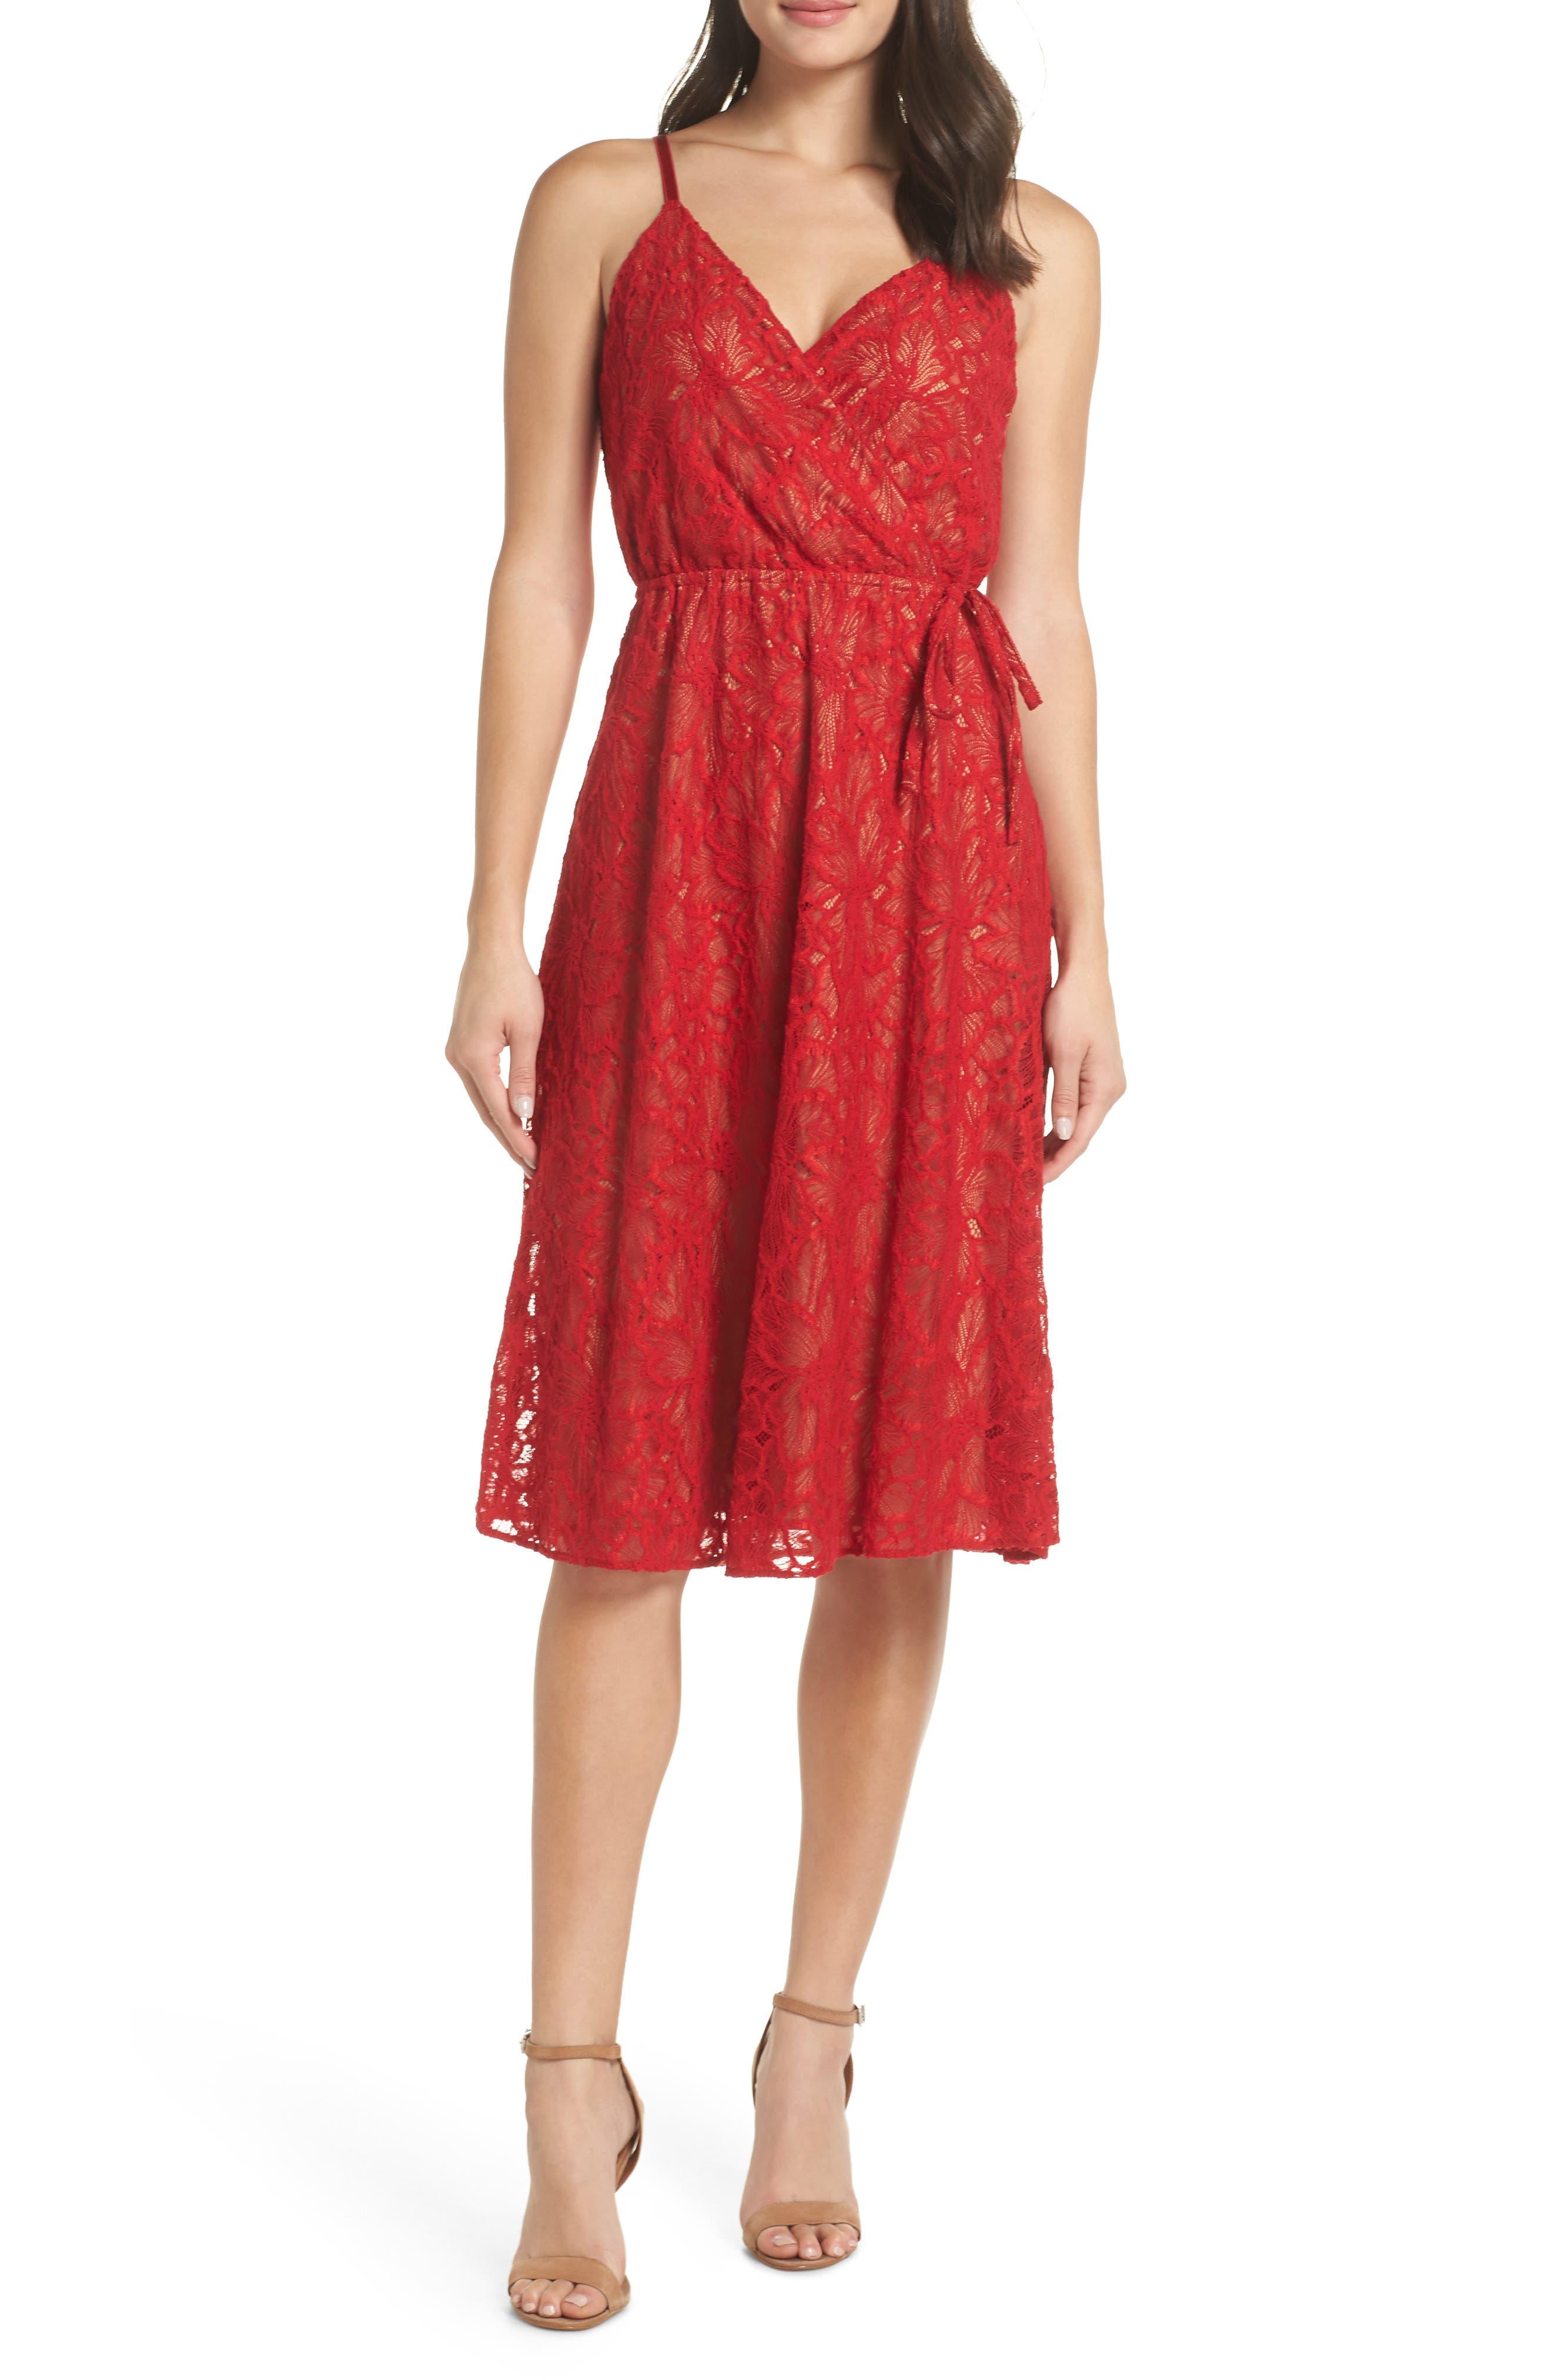 ALI & JAY Cheek to Cheek Lace Midi Dress, Main, color, SCARLET